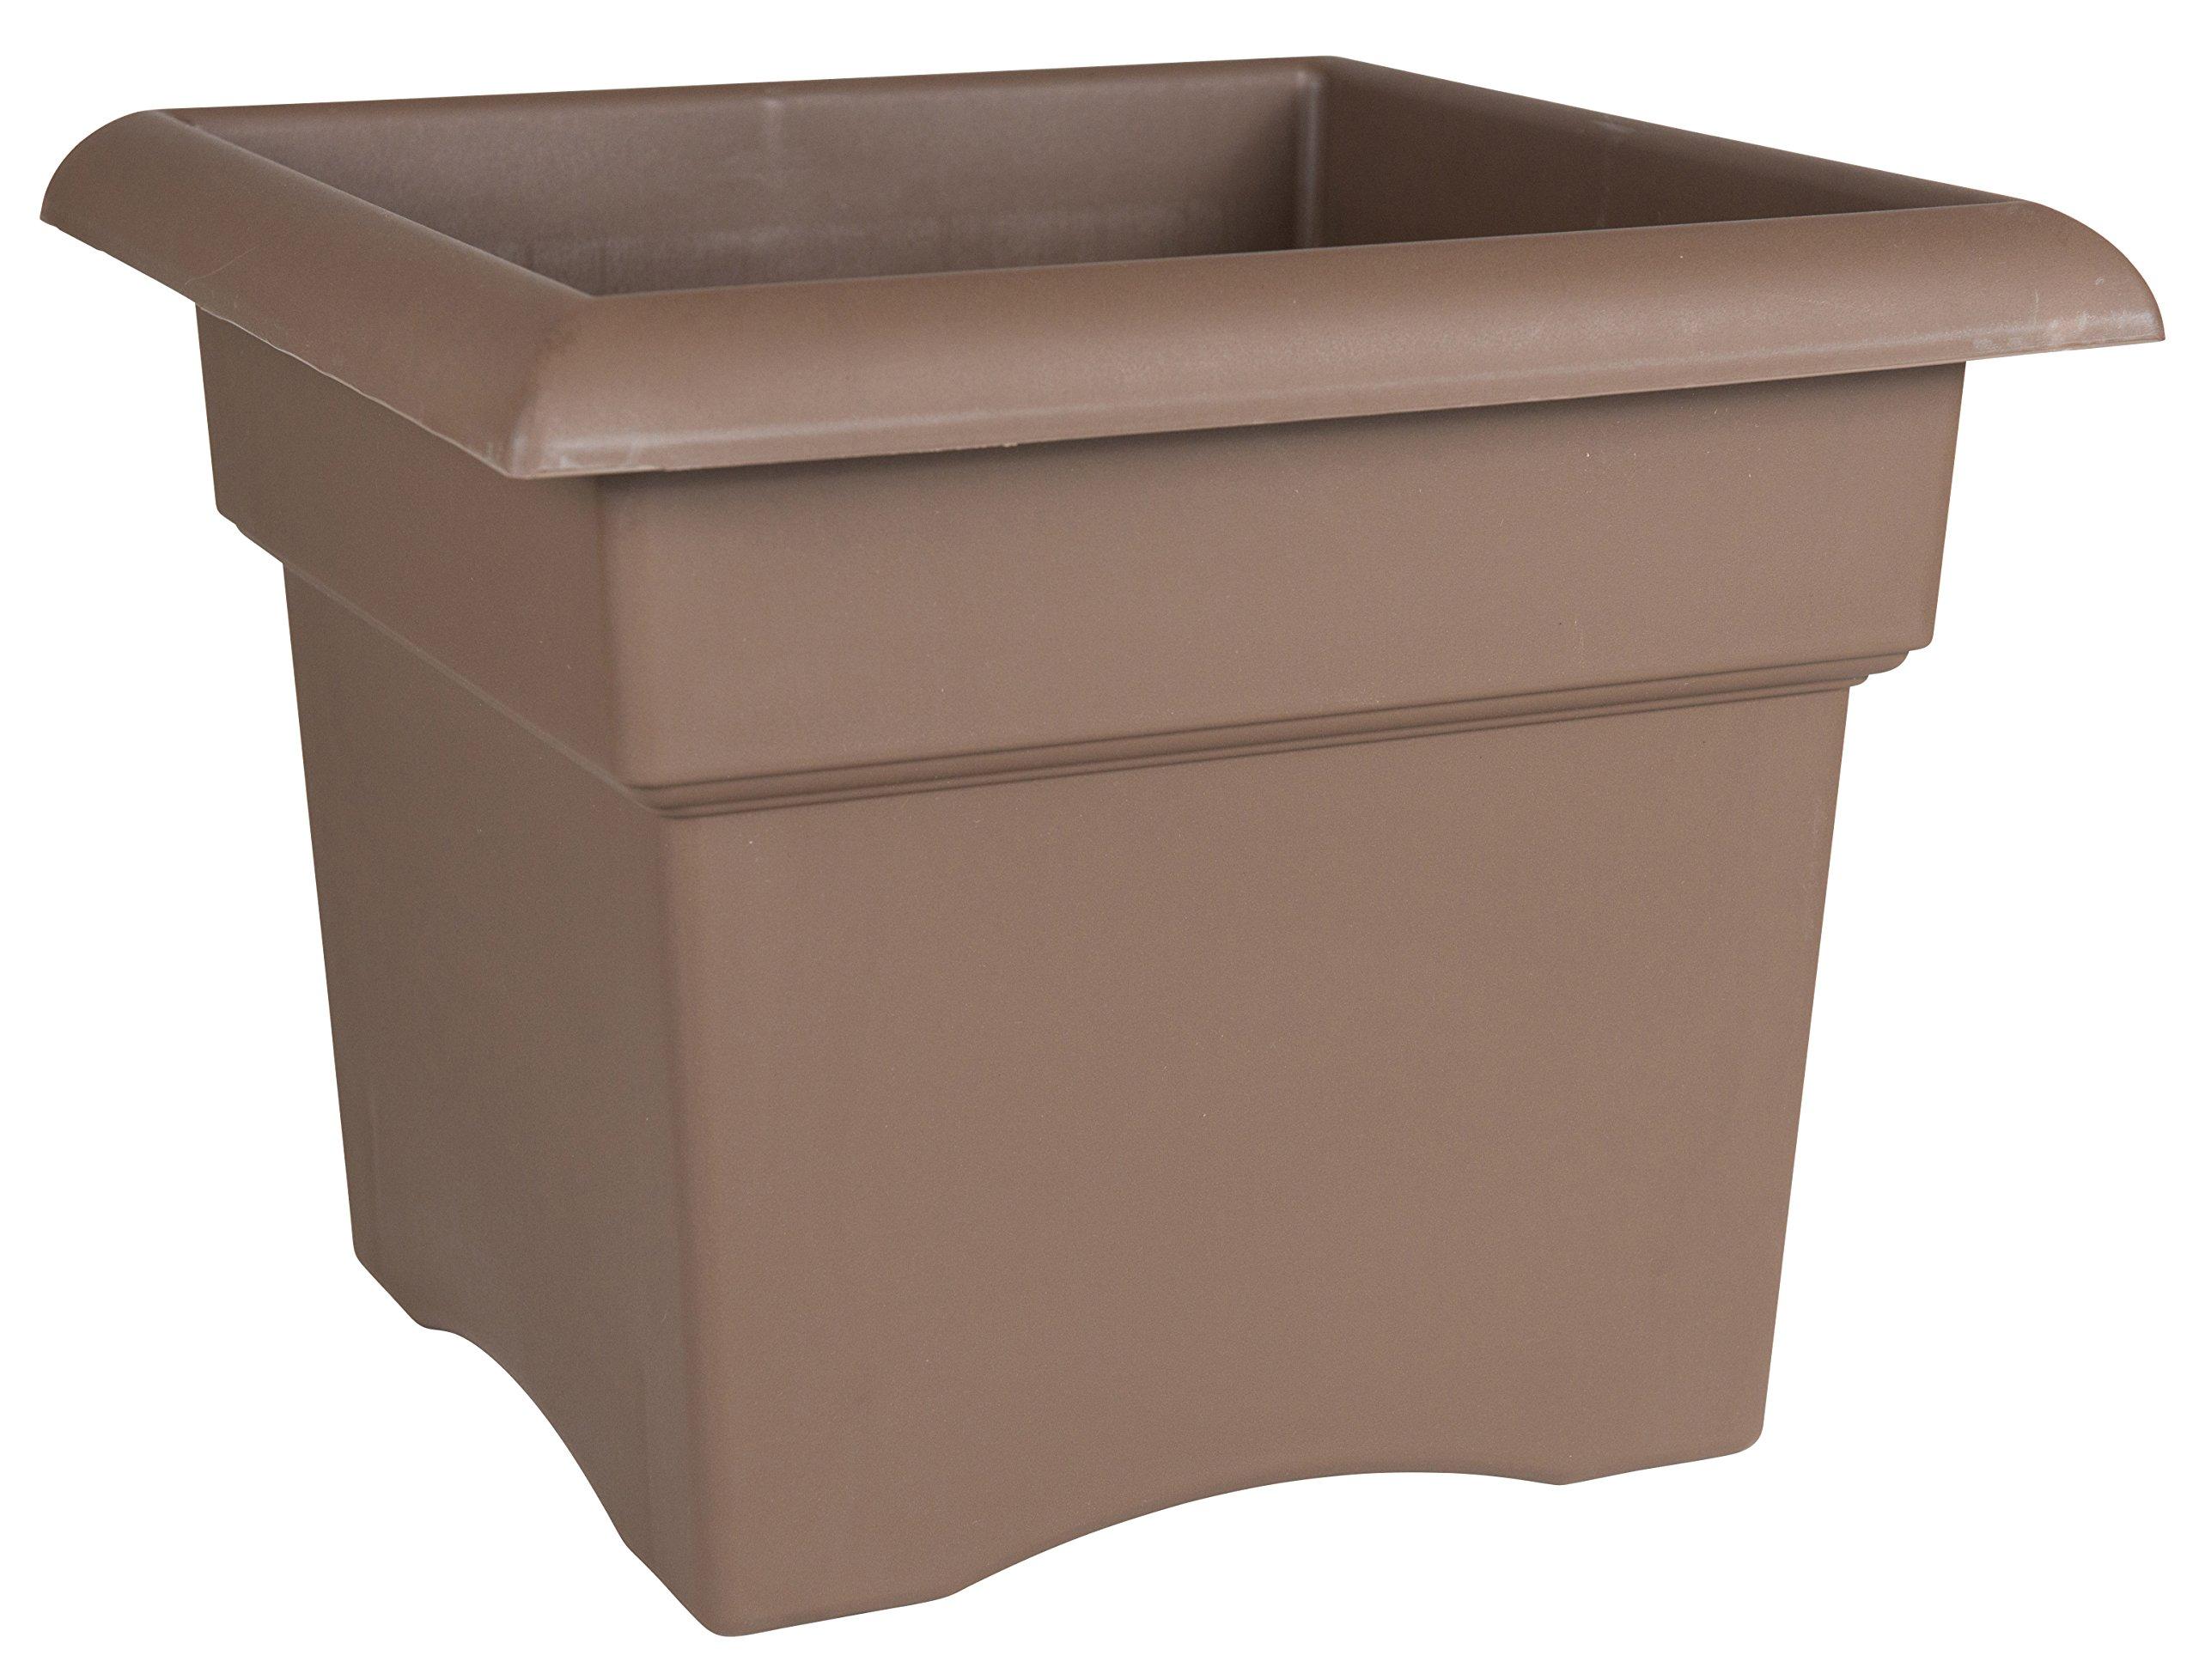 Bloem 457185-1001 Veranda Deck Box Planter, Chocolate by Bloem